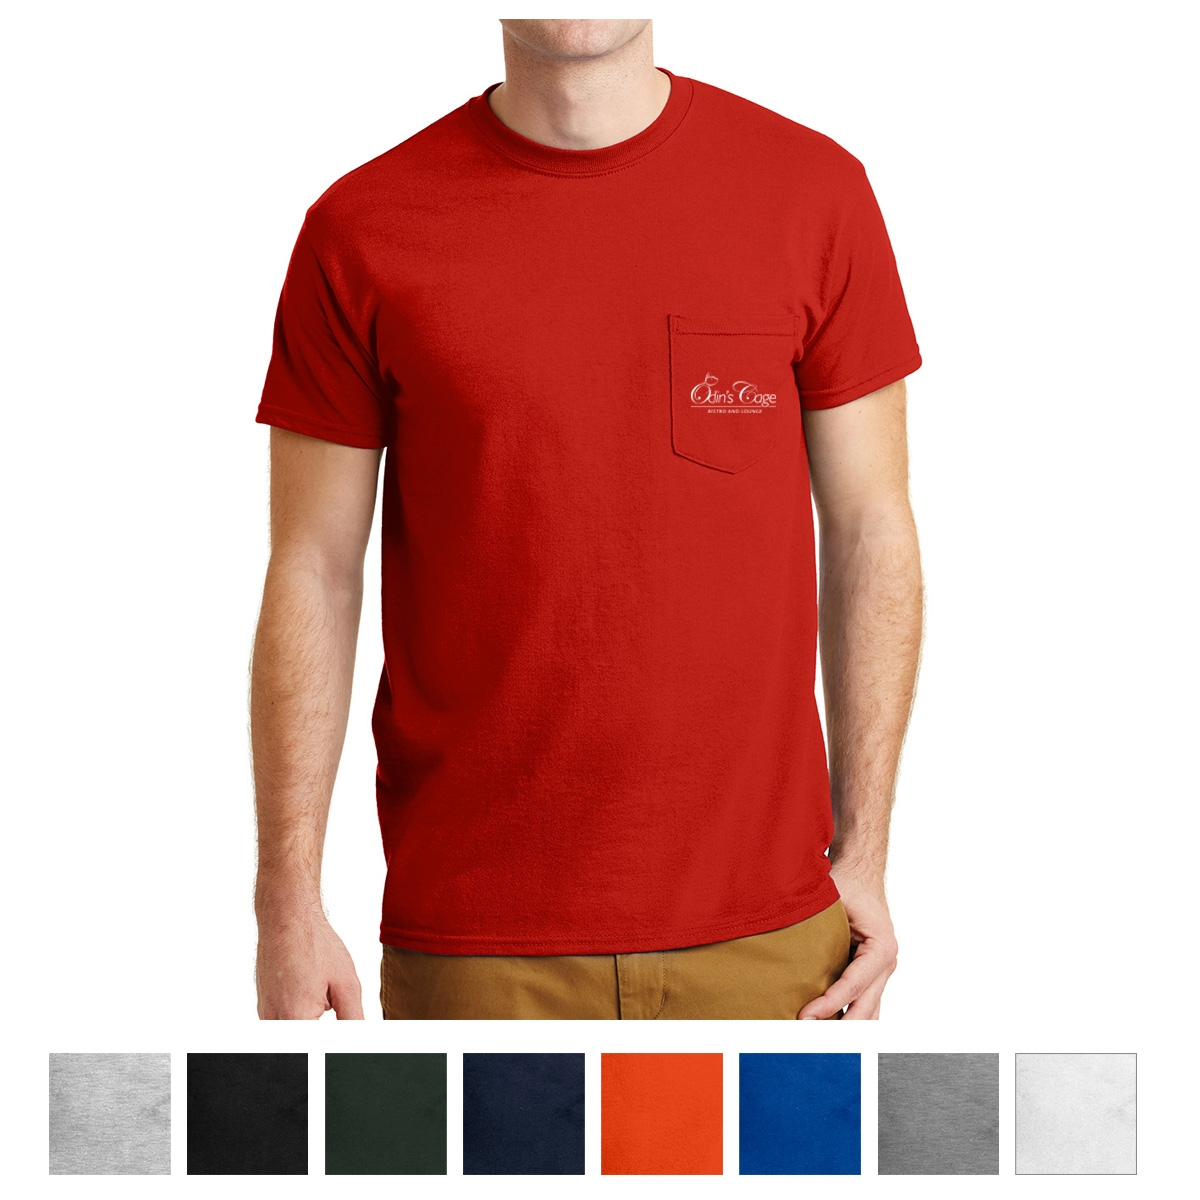 5c9952df Gildan® - DryBlend® 50 Cotton/50 Poly Pocket T-Shirt. 8300 - Custom ...